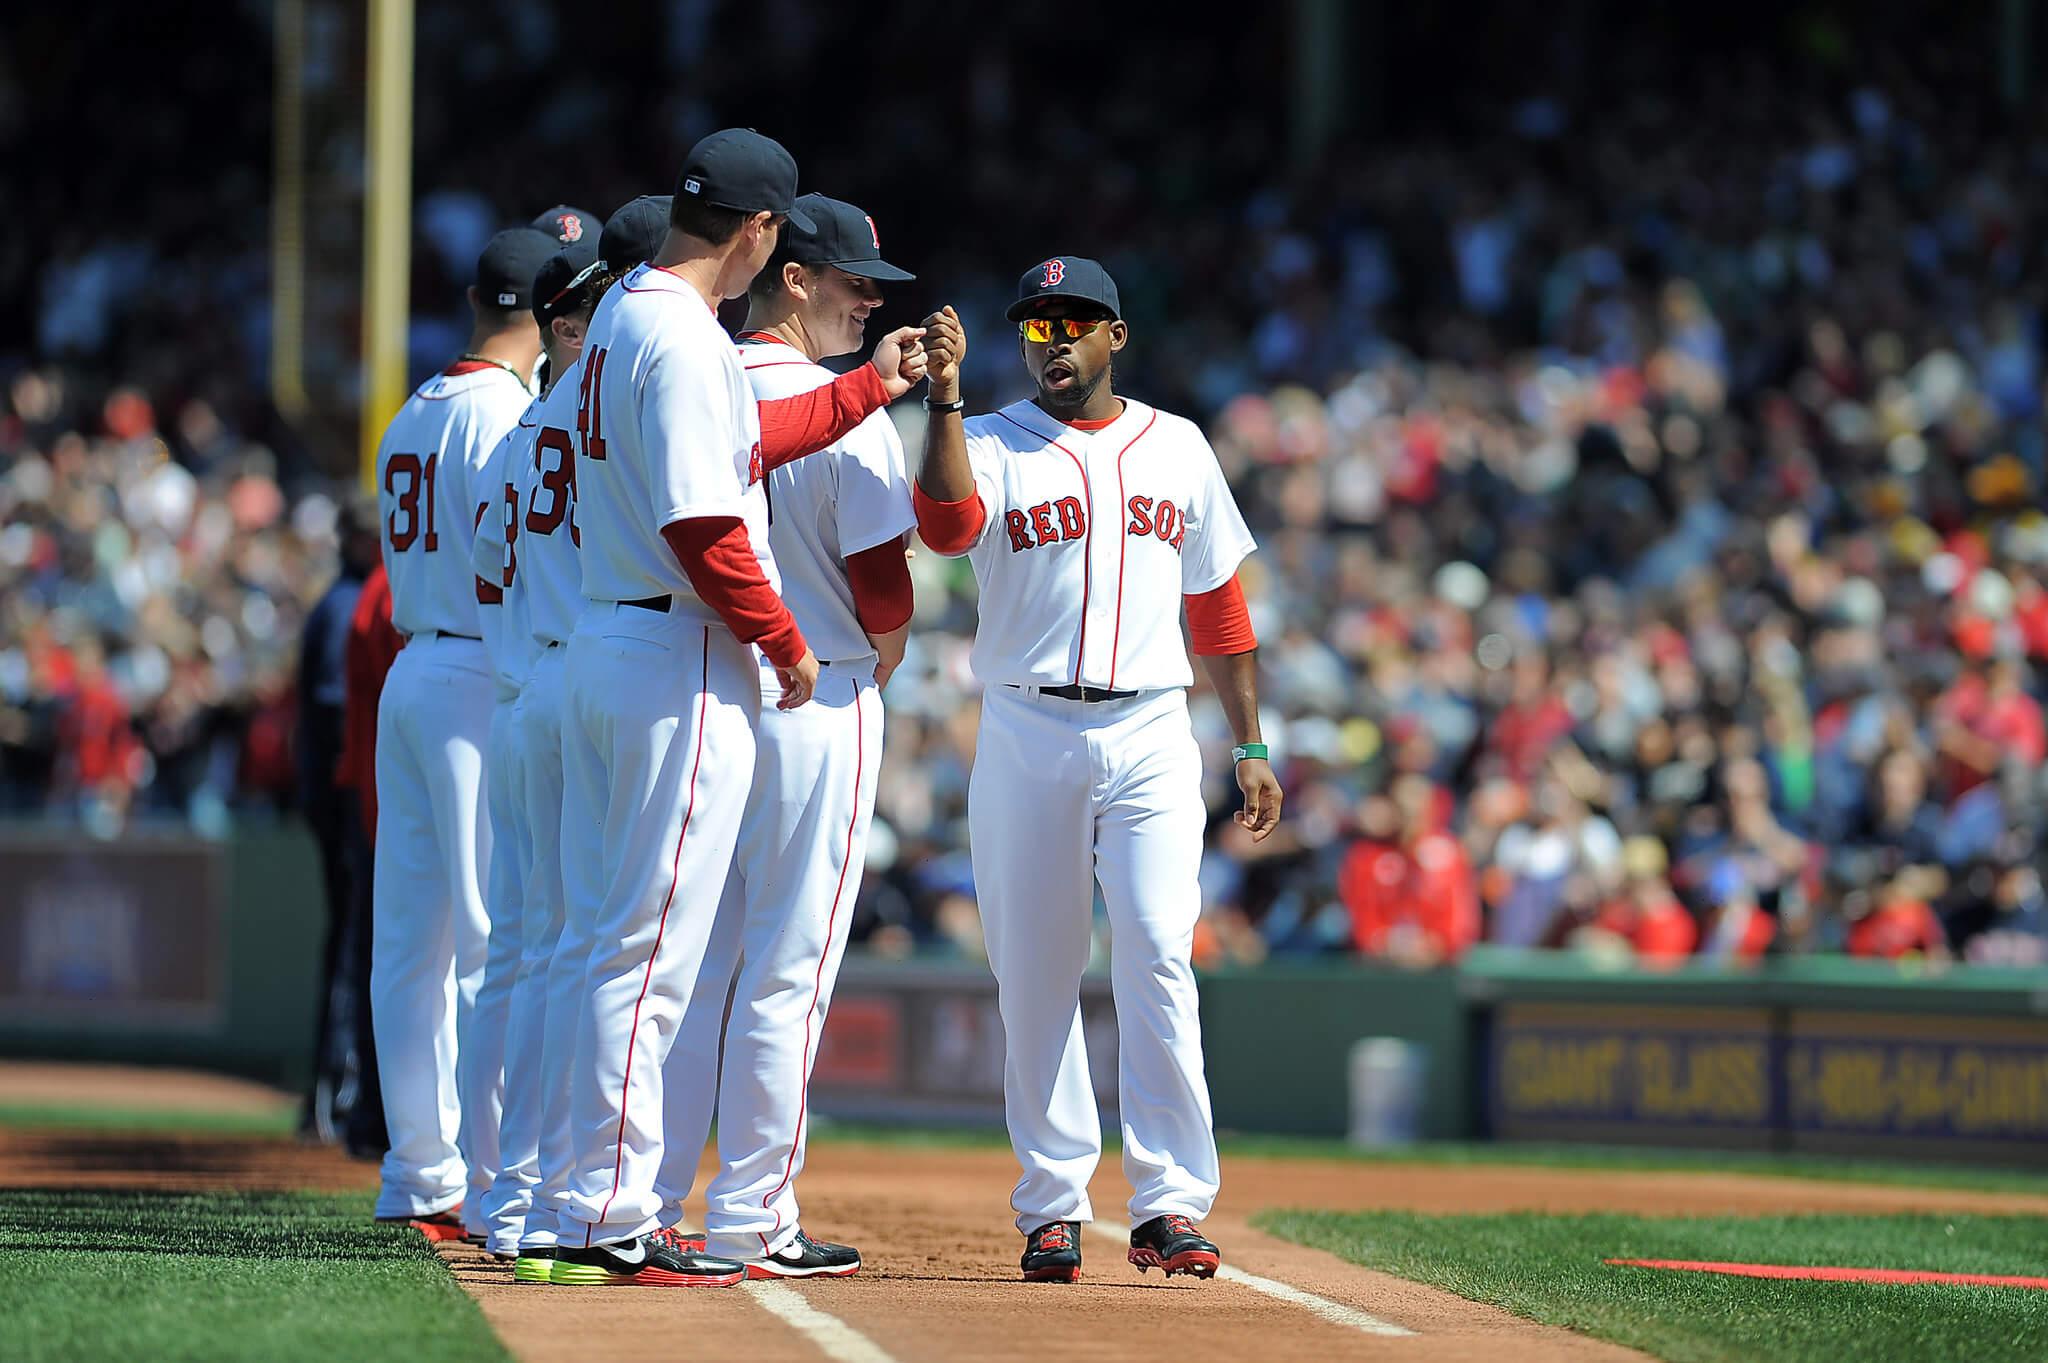 Boston Red Sox baseball game players